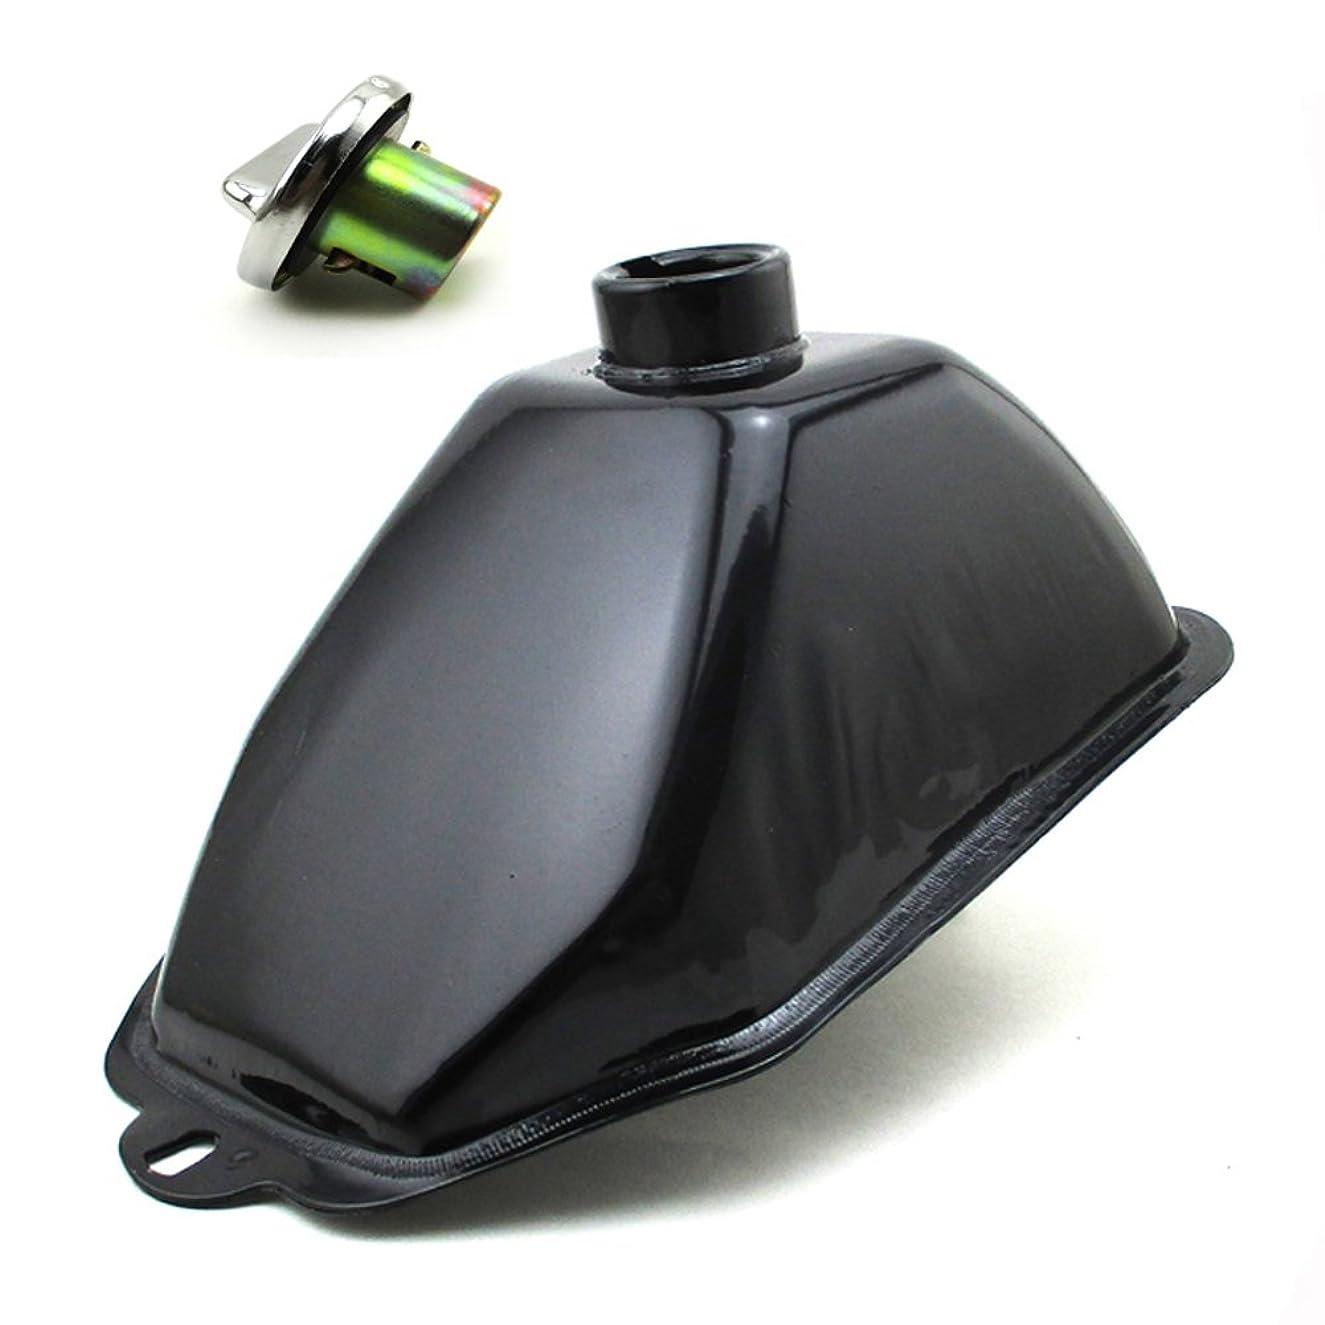 TC-Motor Metal Fuel Gas Tank + Fuel Tank Cap Cover For Chinese ATV Kids Quad 50cc 70cc 90cc 110cc 125cc 4 Wheeler